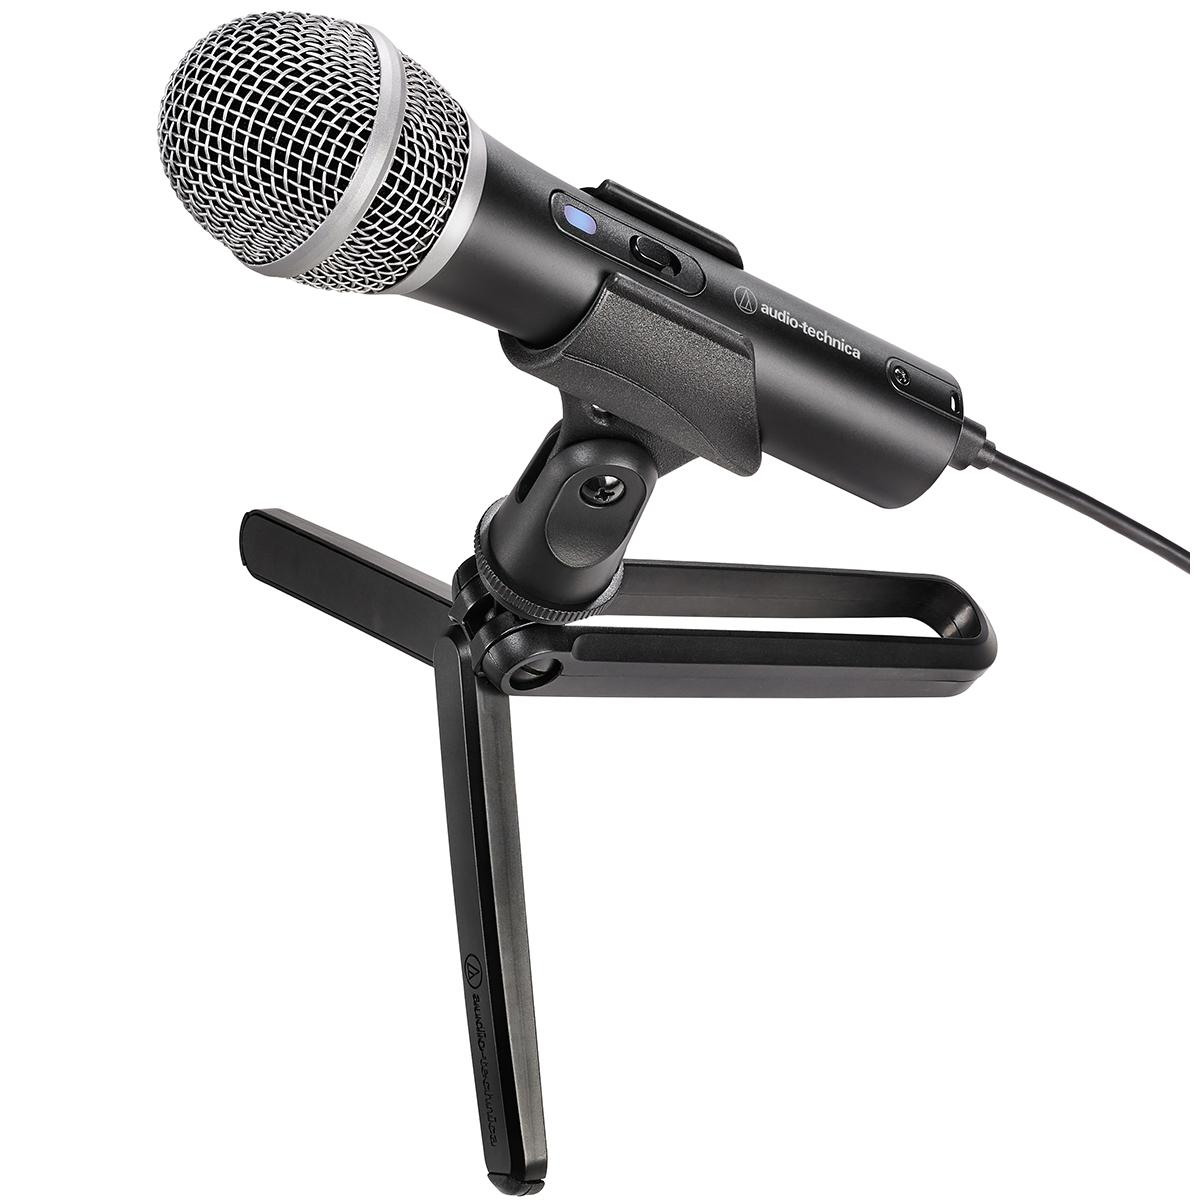 Audio-technica Headphone + USB Microphone Bundle ATR2100X/ATH-S100 image 5